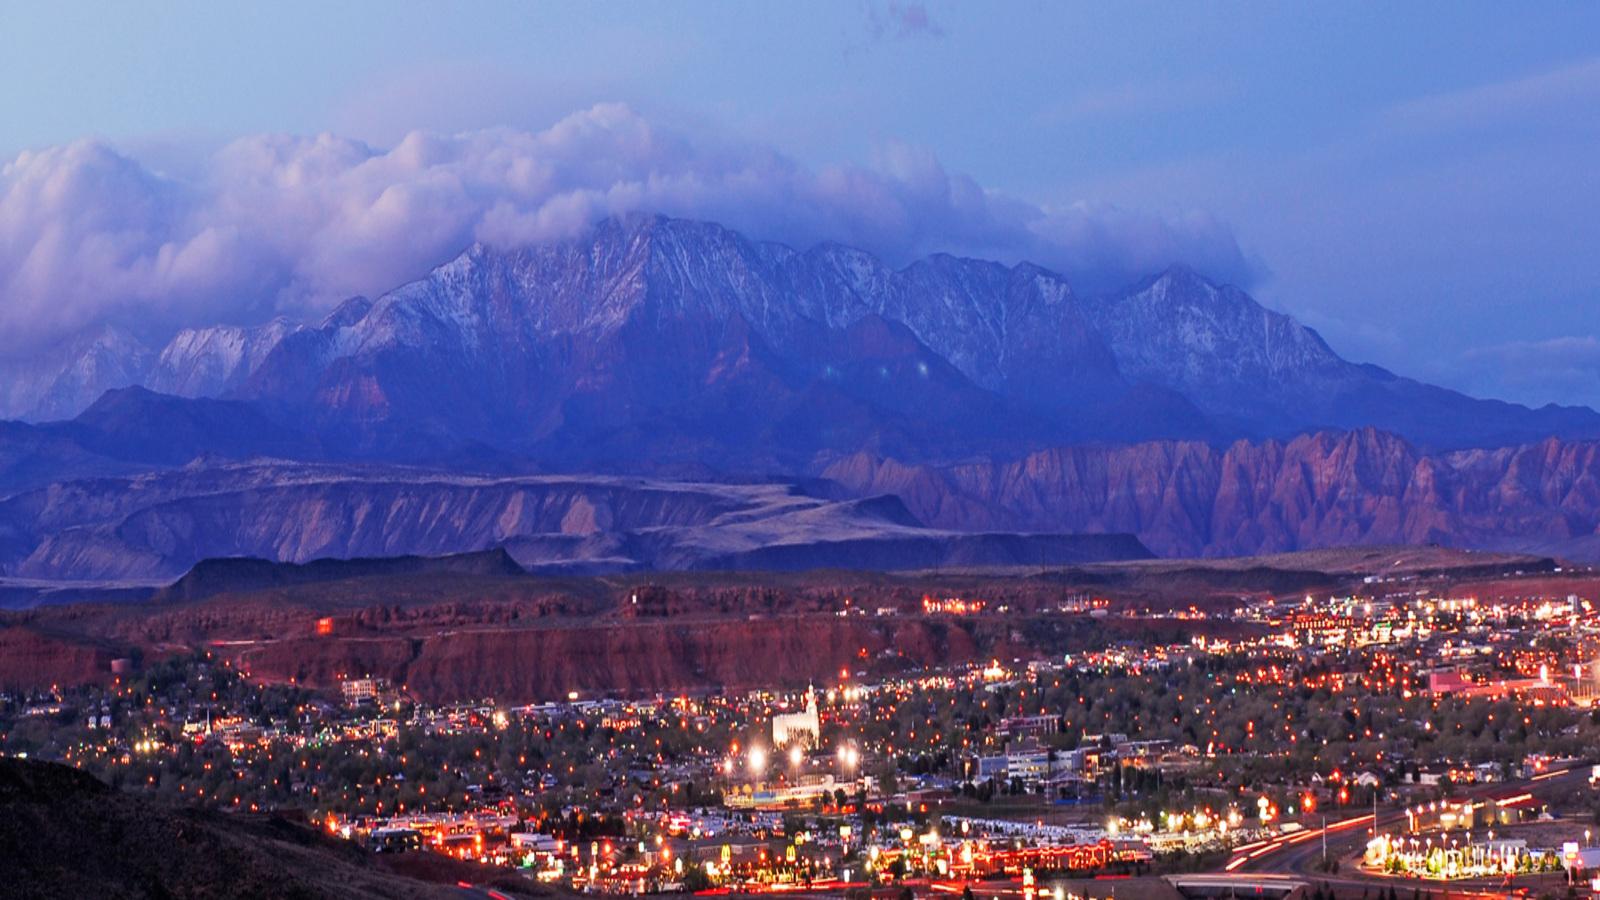 St George Utah Real Estate Market Report - February 2021